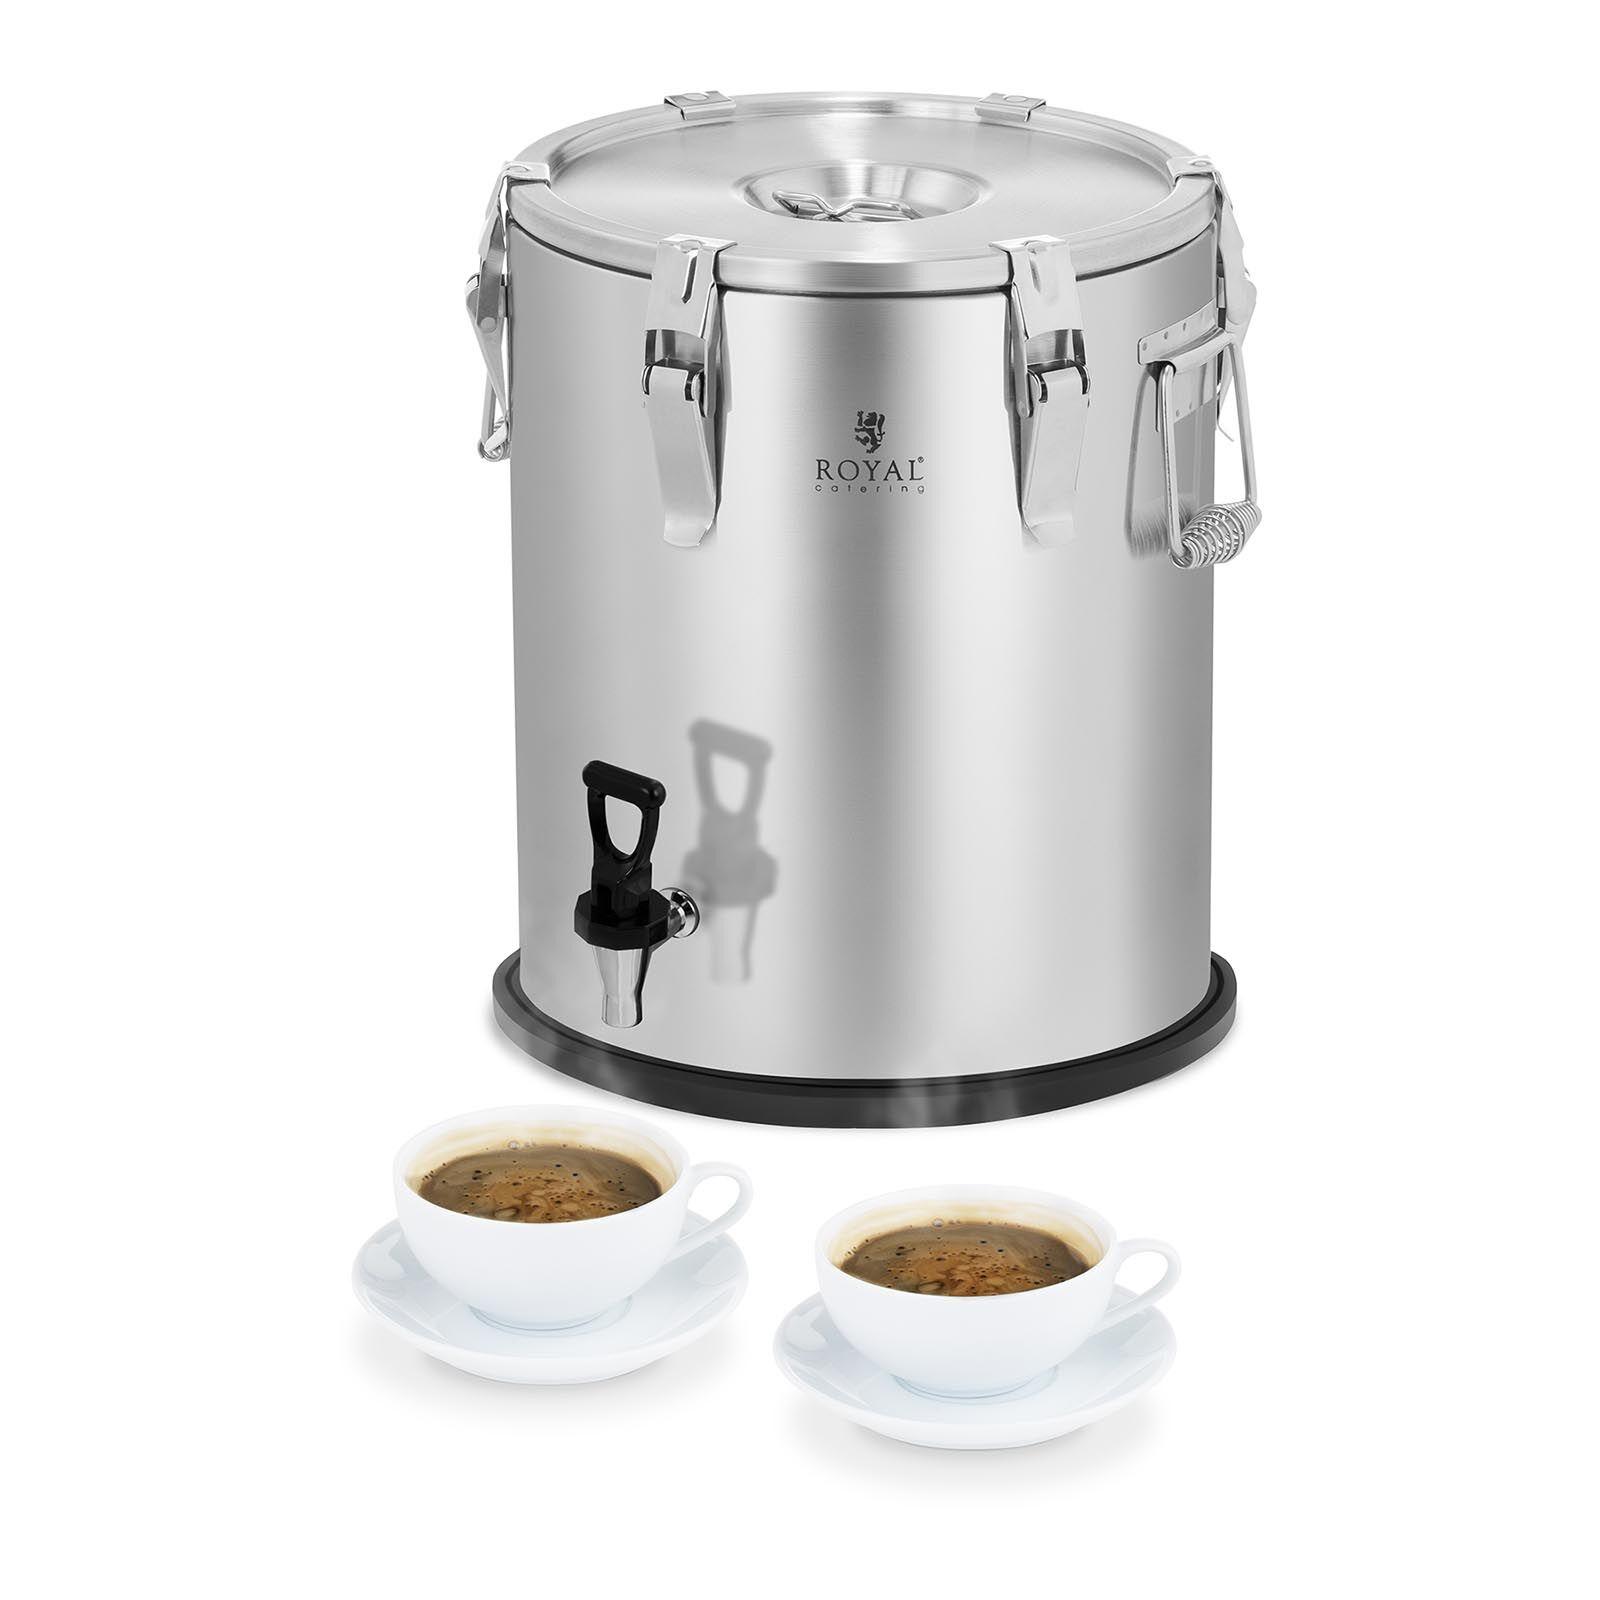 Royal Catering Conteneur isotherme - acier inoxydable - 25 L - avec robinet